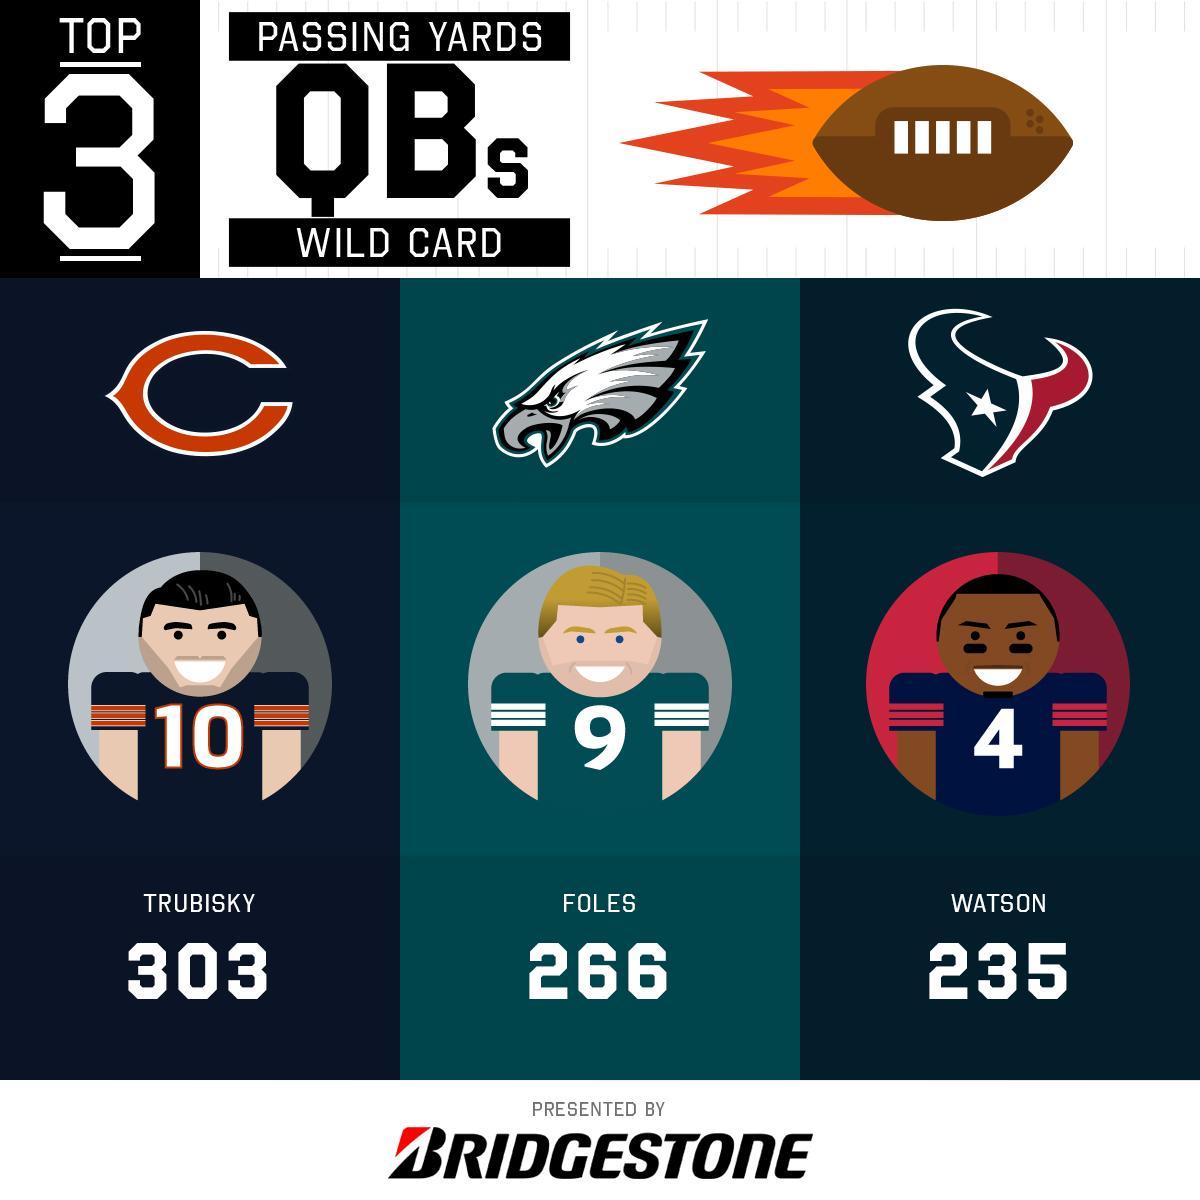 2018 Wild Card Round Passing Leaders!  (by @Bridgestone) https://t.co/XSnaTPzCRD